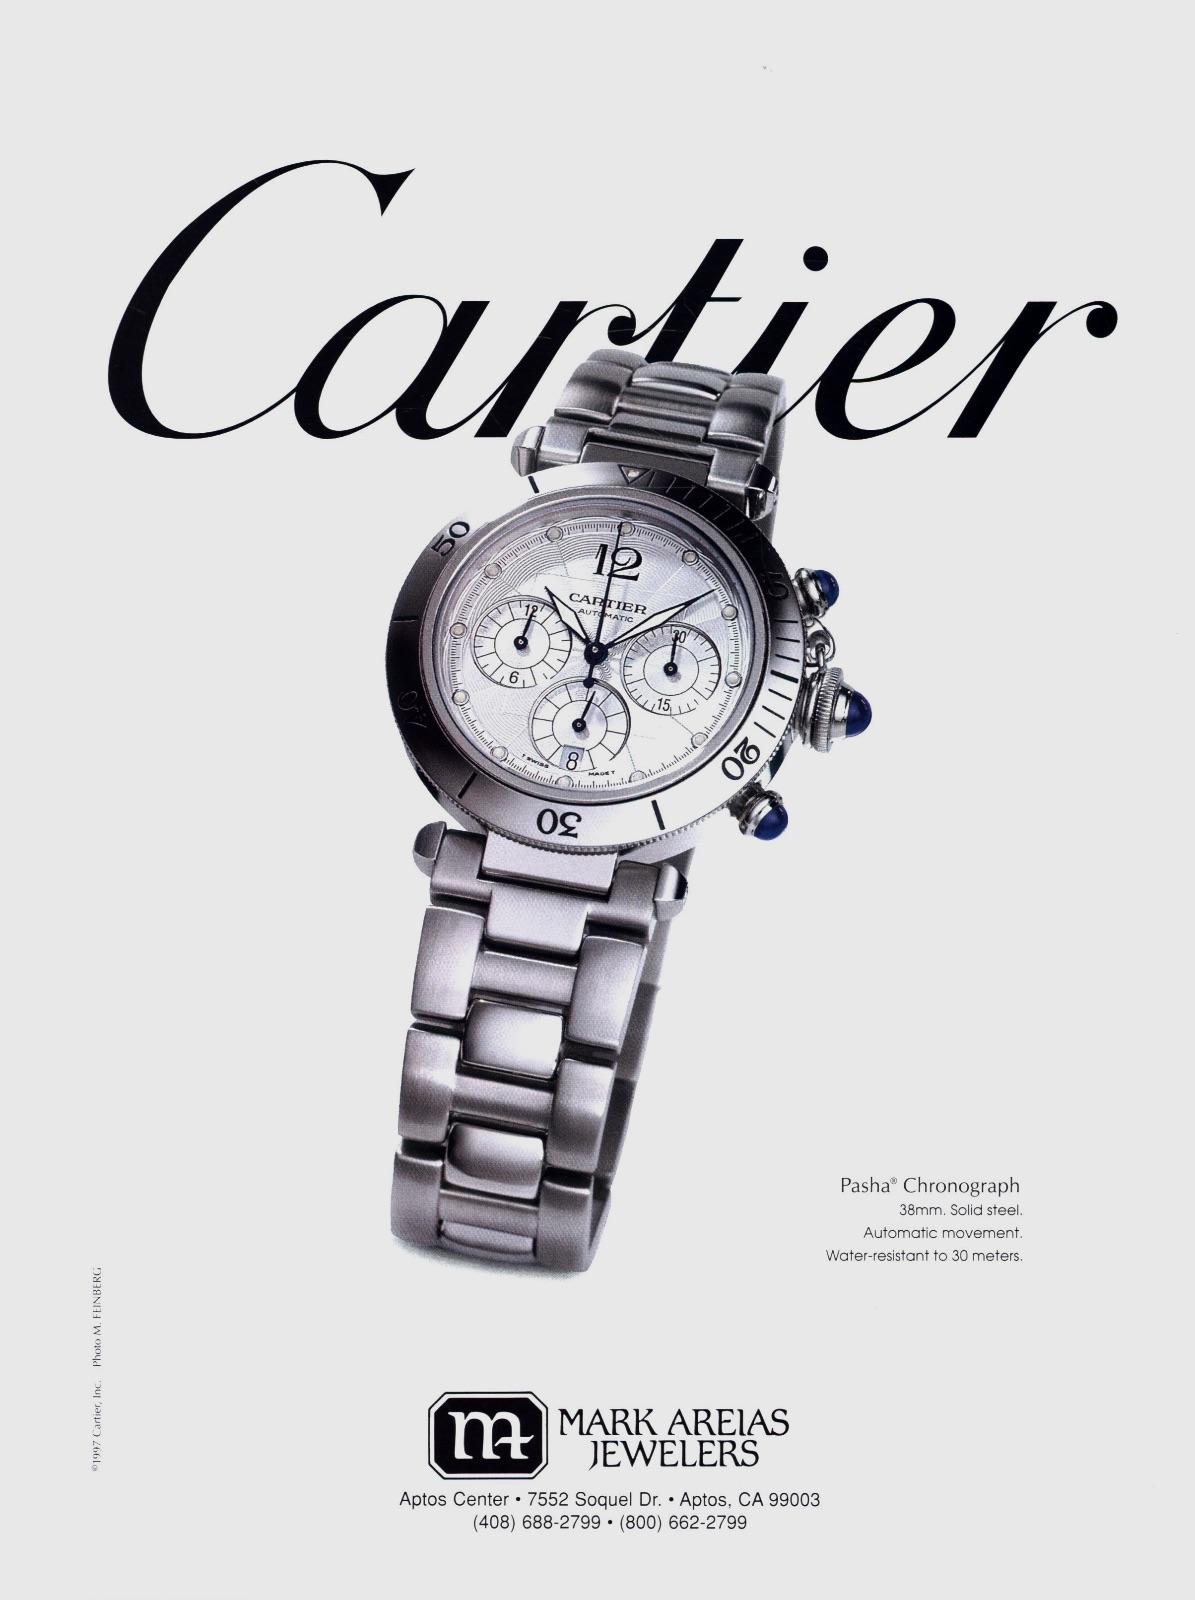 pasha de Cartier watch advert print - 5